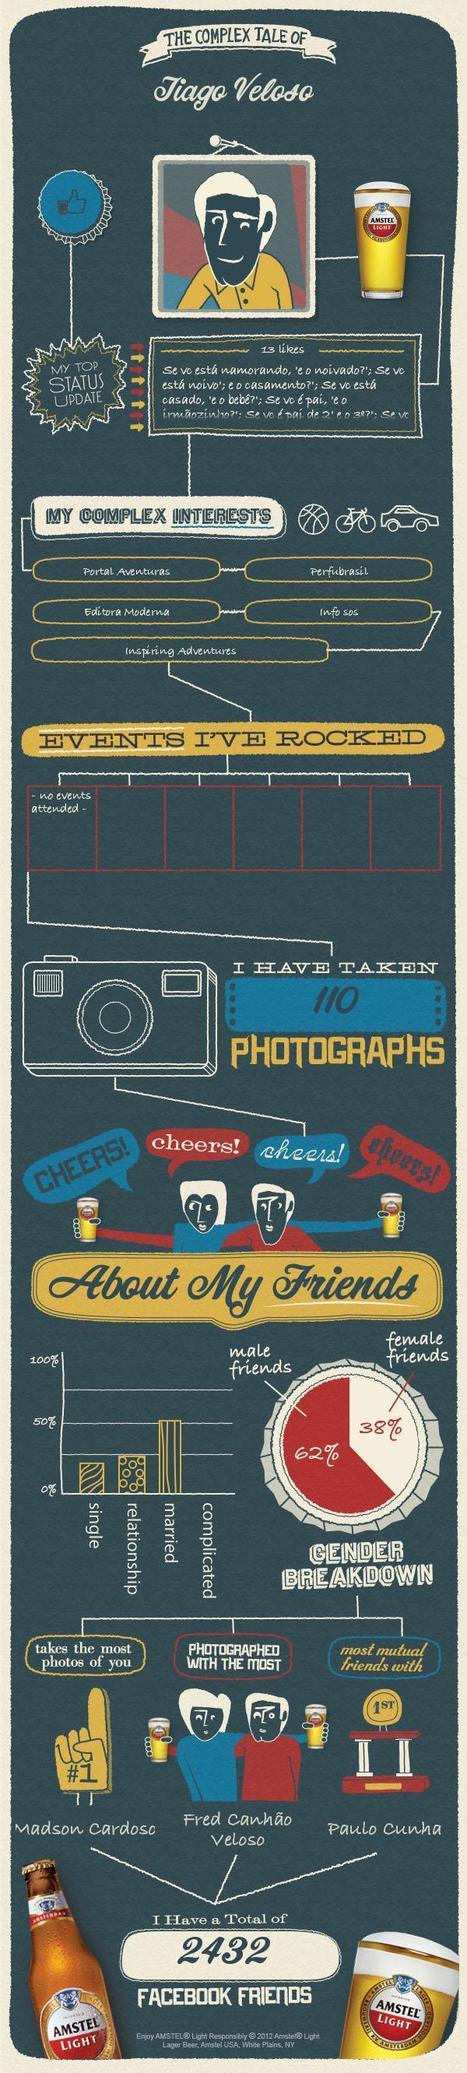 My Complex Facebook Tale by Amstel | A (minha) Vida Digital | Scoop.it